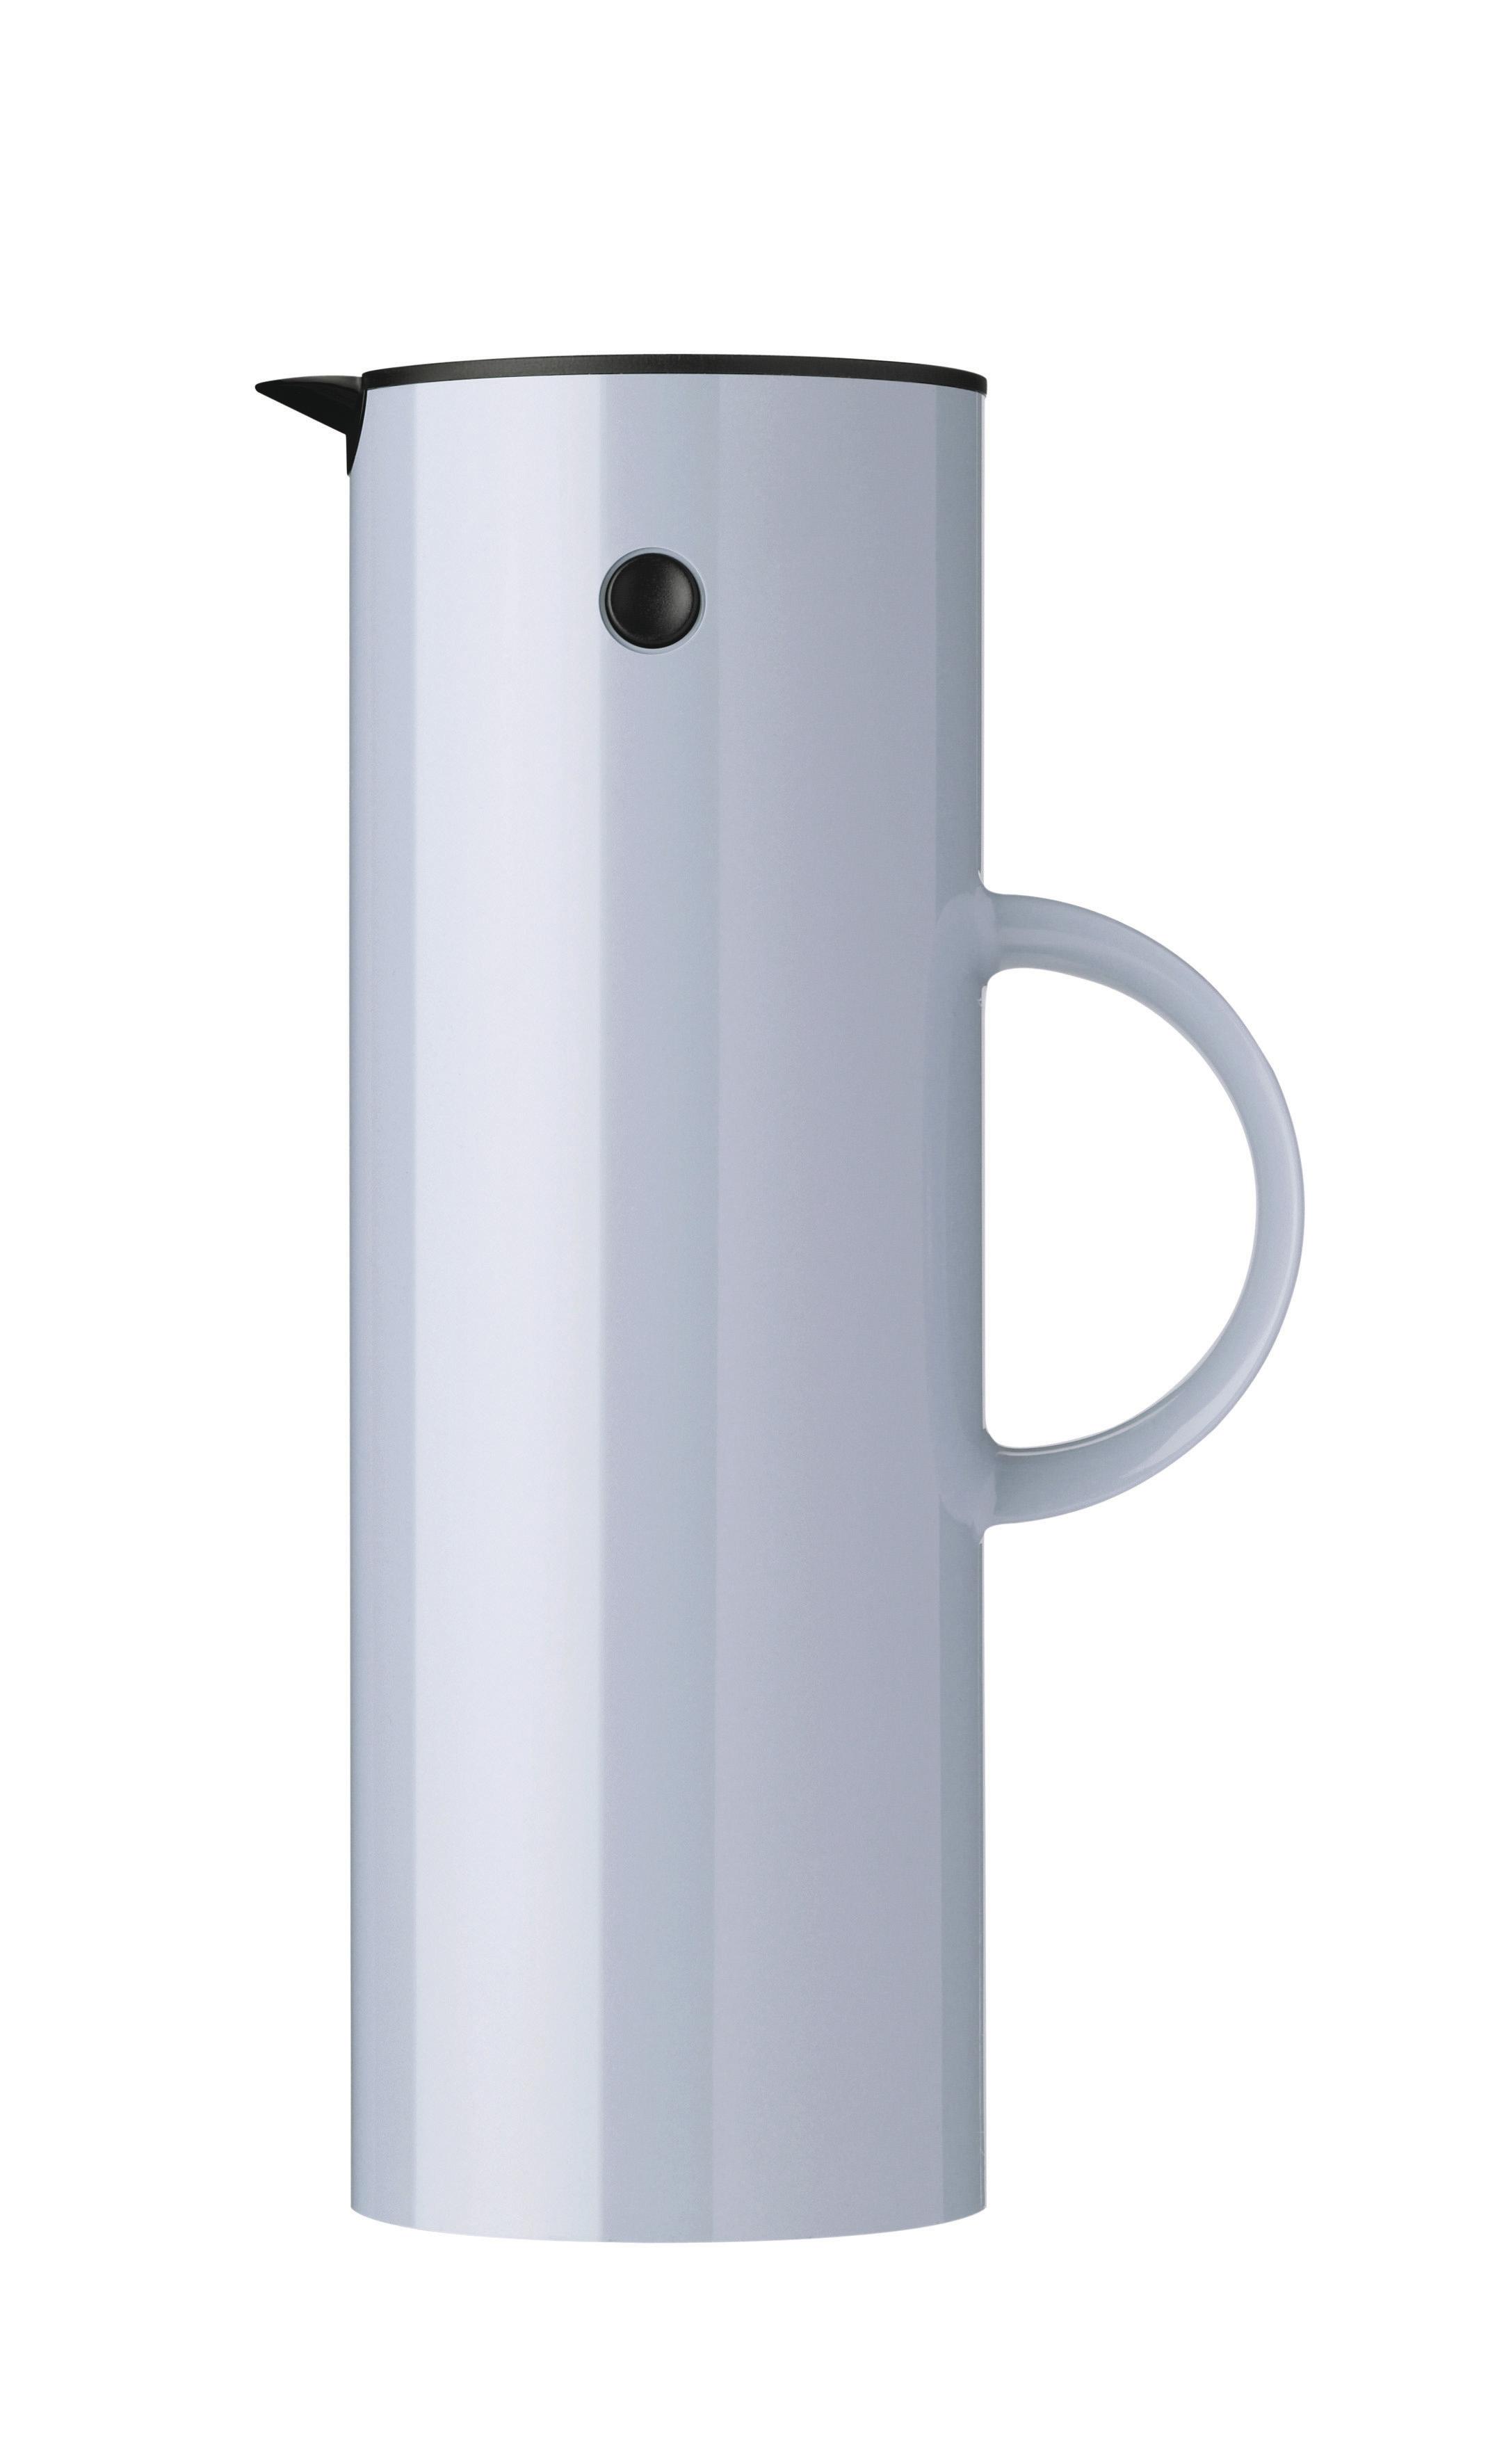 Stelton EM77 termokande, 1 liter